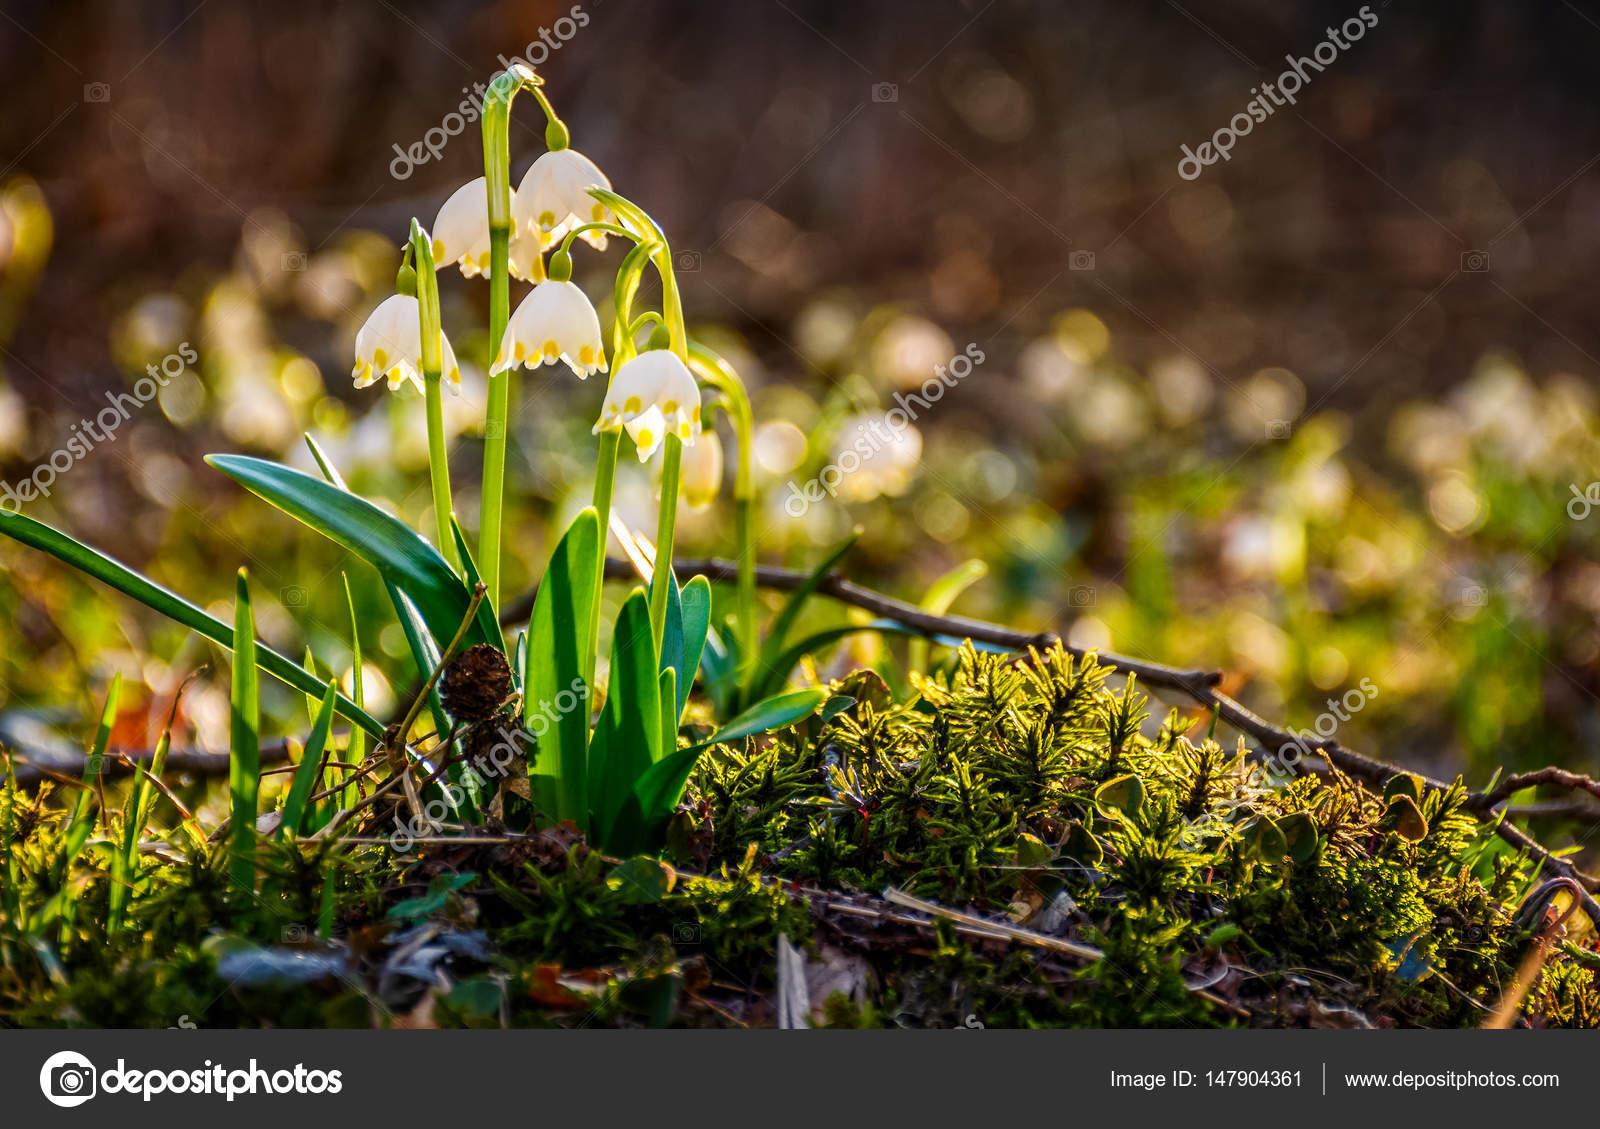 Schneeflocke Erste Blumen Des Fruhlings Stockfoto C Pellinni